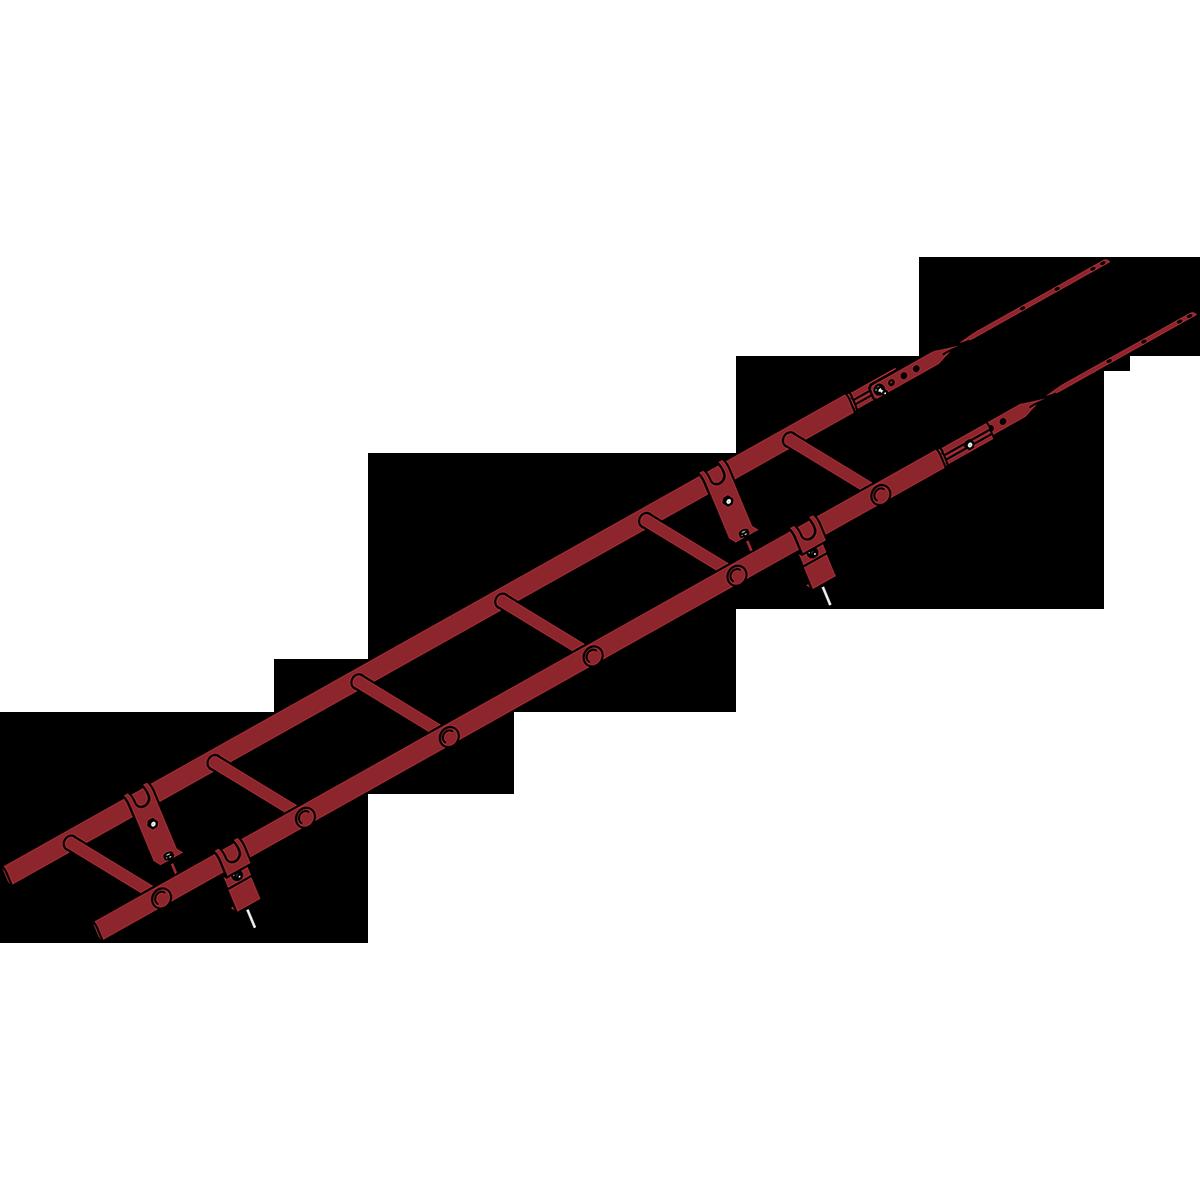 Лестница кровельная ROOFSYSTEMS PRESTIGE ZN 45х25 (овал) 400 унивеpсальная 1,2 м RAL 3011 Коричнево-красный